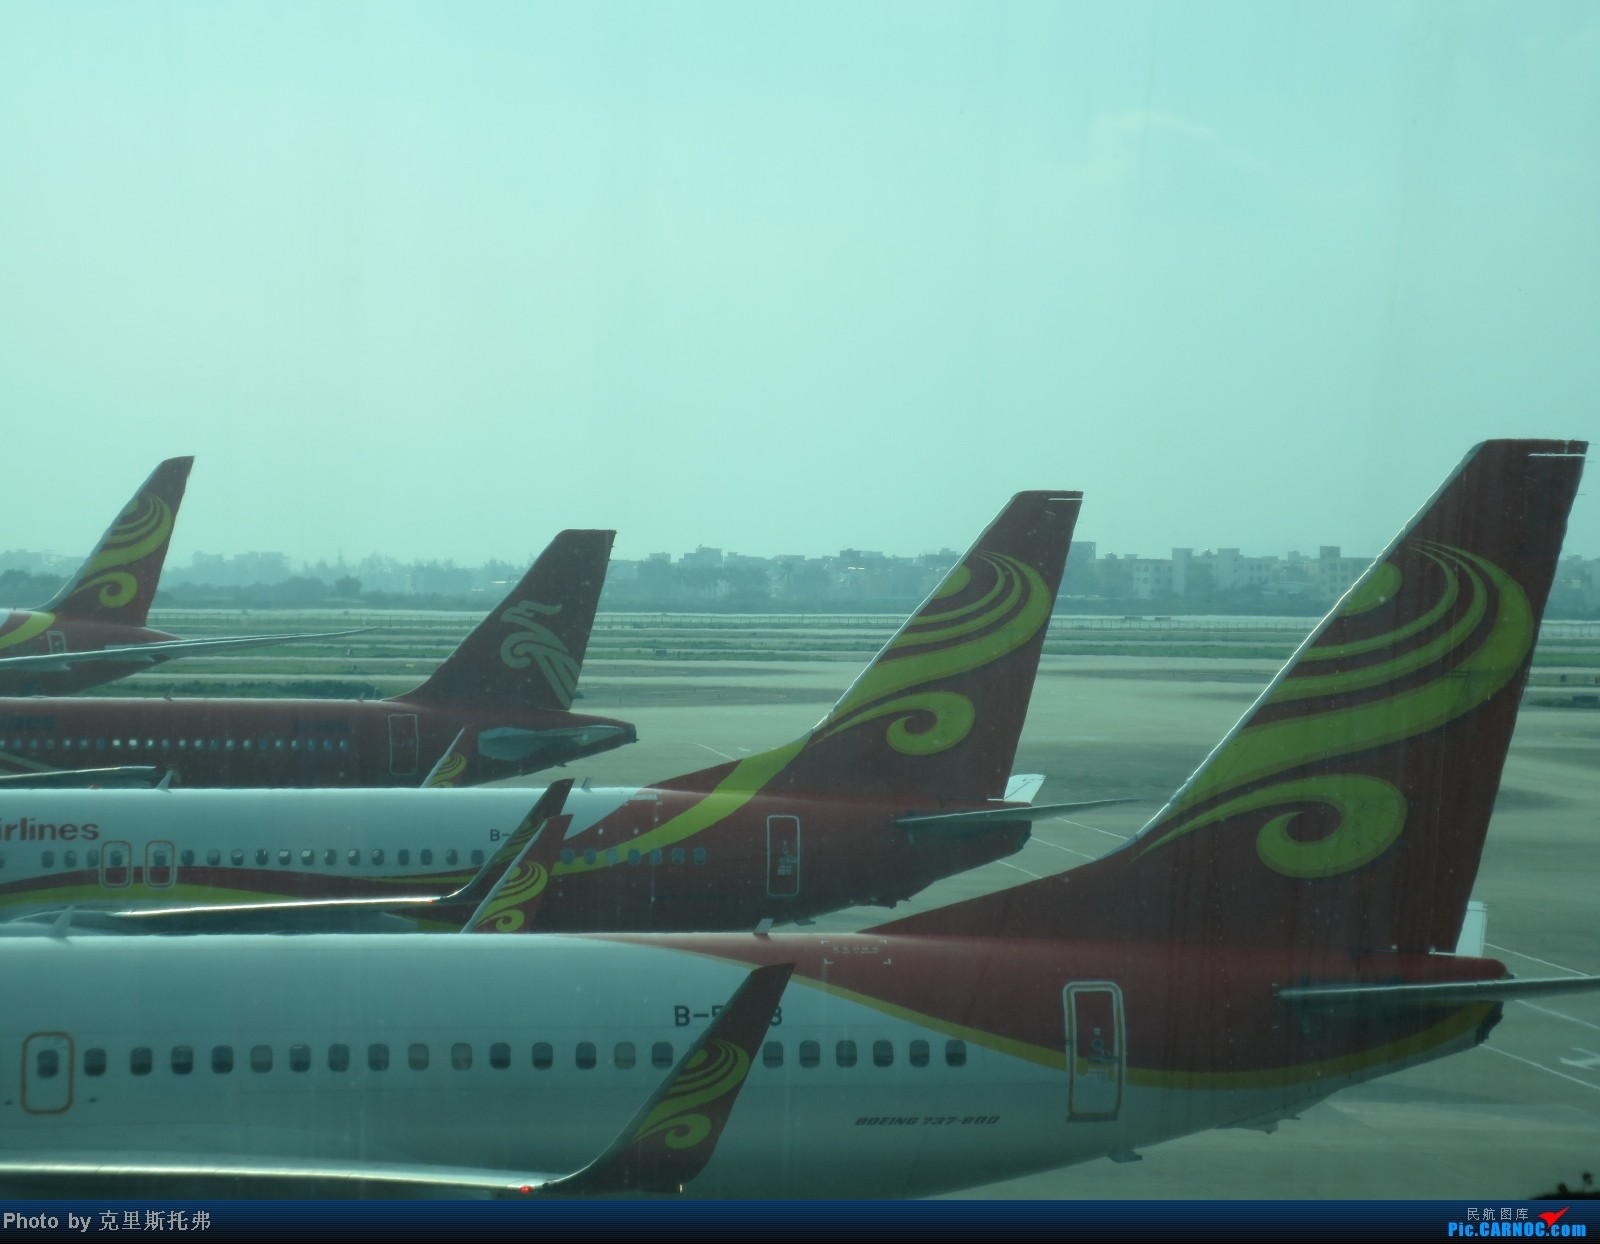 Re:[原创]【广州,你好!】八月齐鲁行 第一集 {初到齐鲁城} 不期而遇,鹏程行万里 相伴相惜,享飞行至美 BOEING 787-8 B-2731